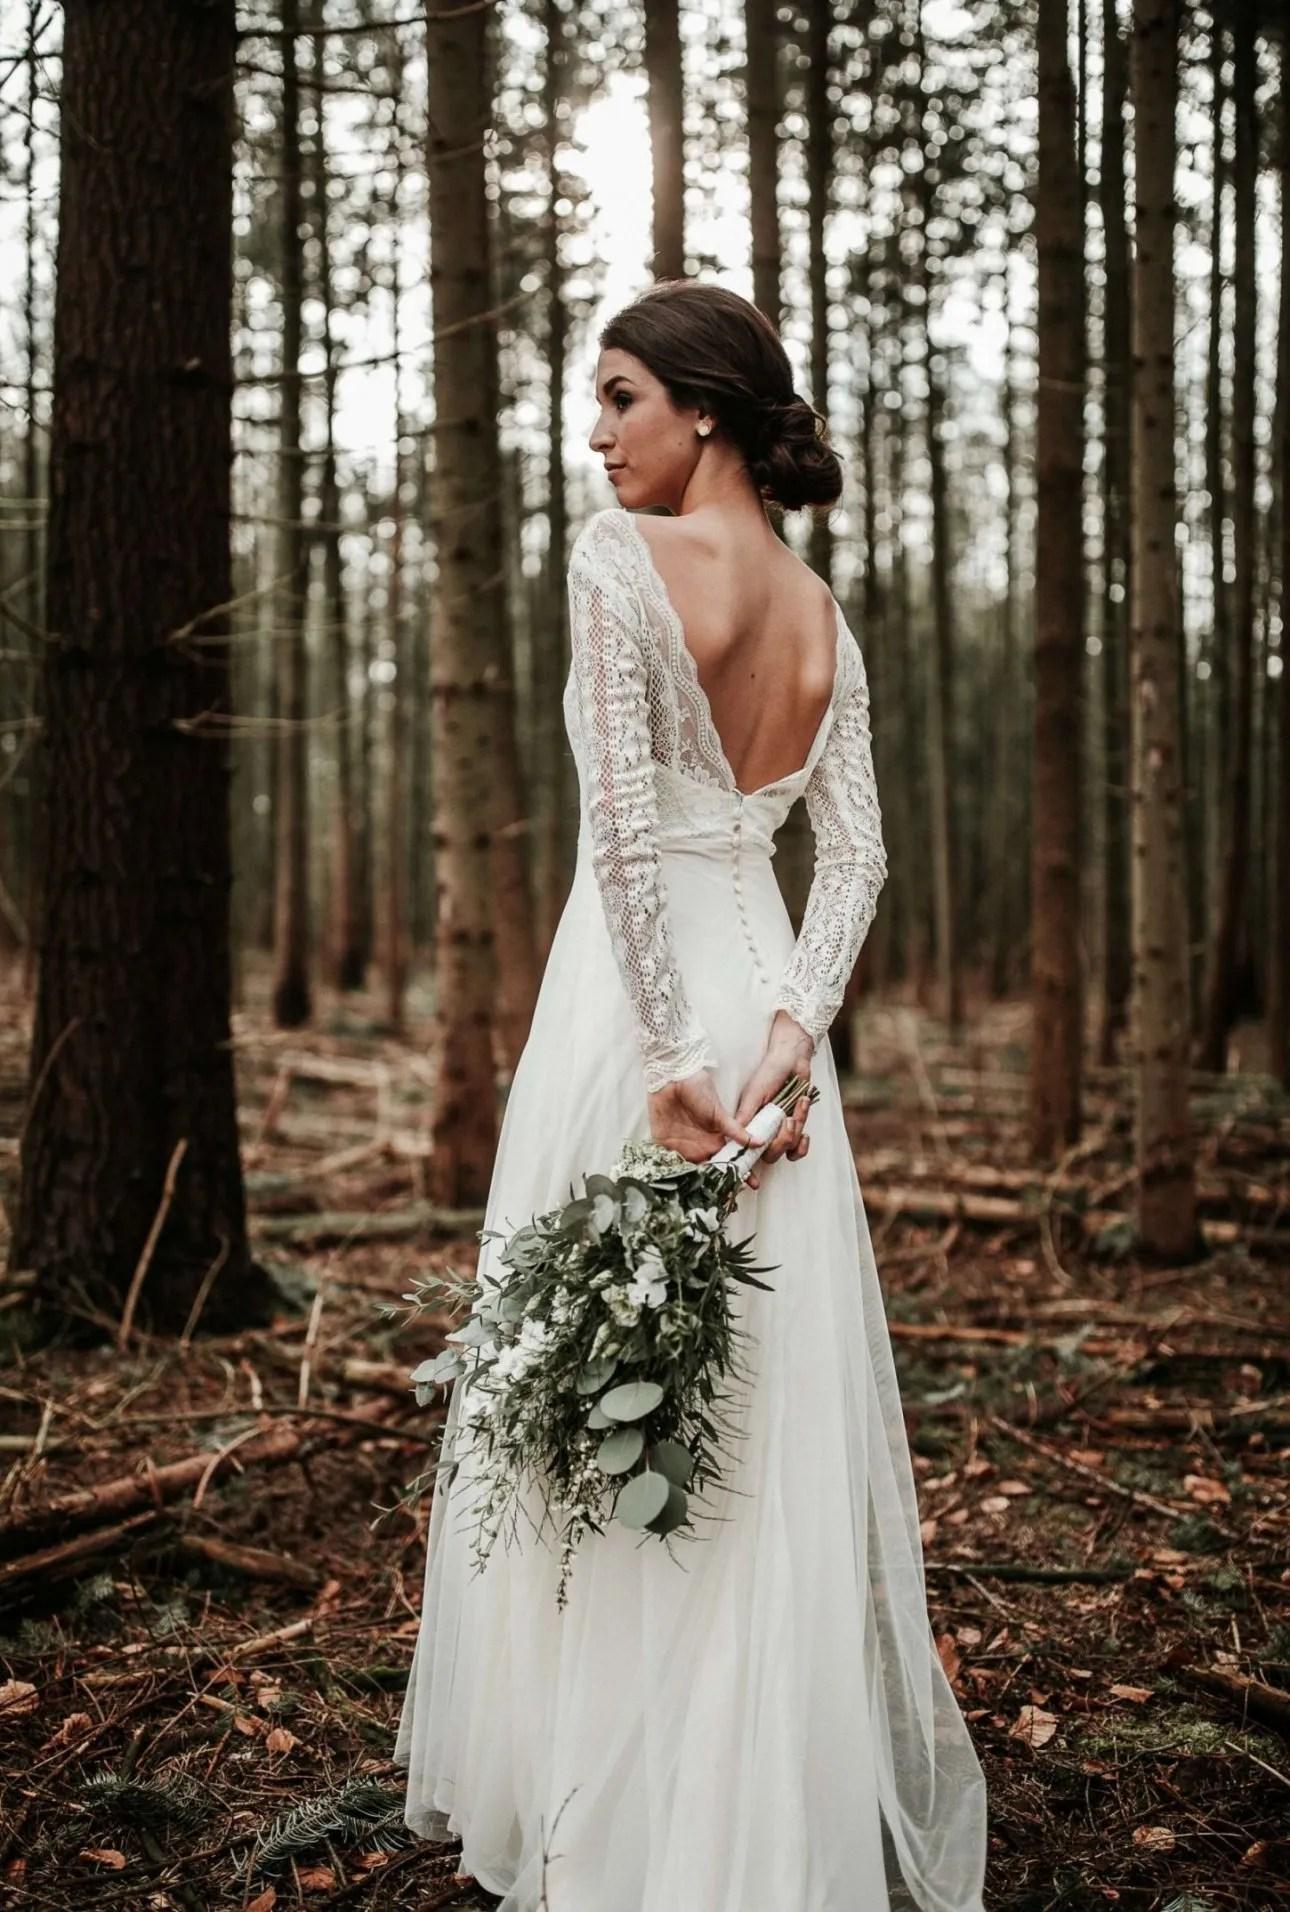 Minimalistische bruiloft minimal wedding bruidsboeket bruid bos styling www.tablemoments.nl